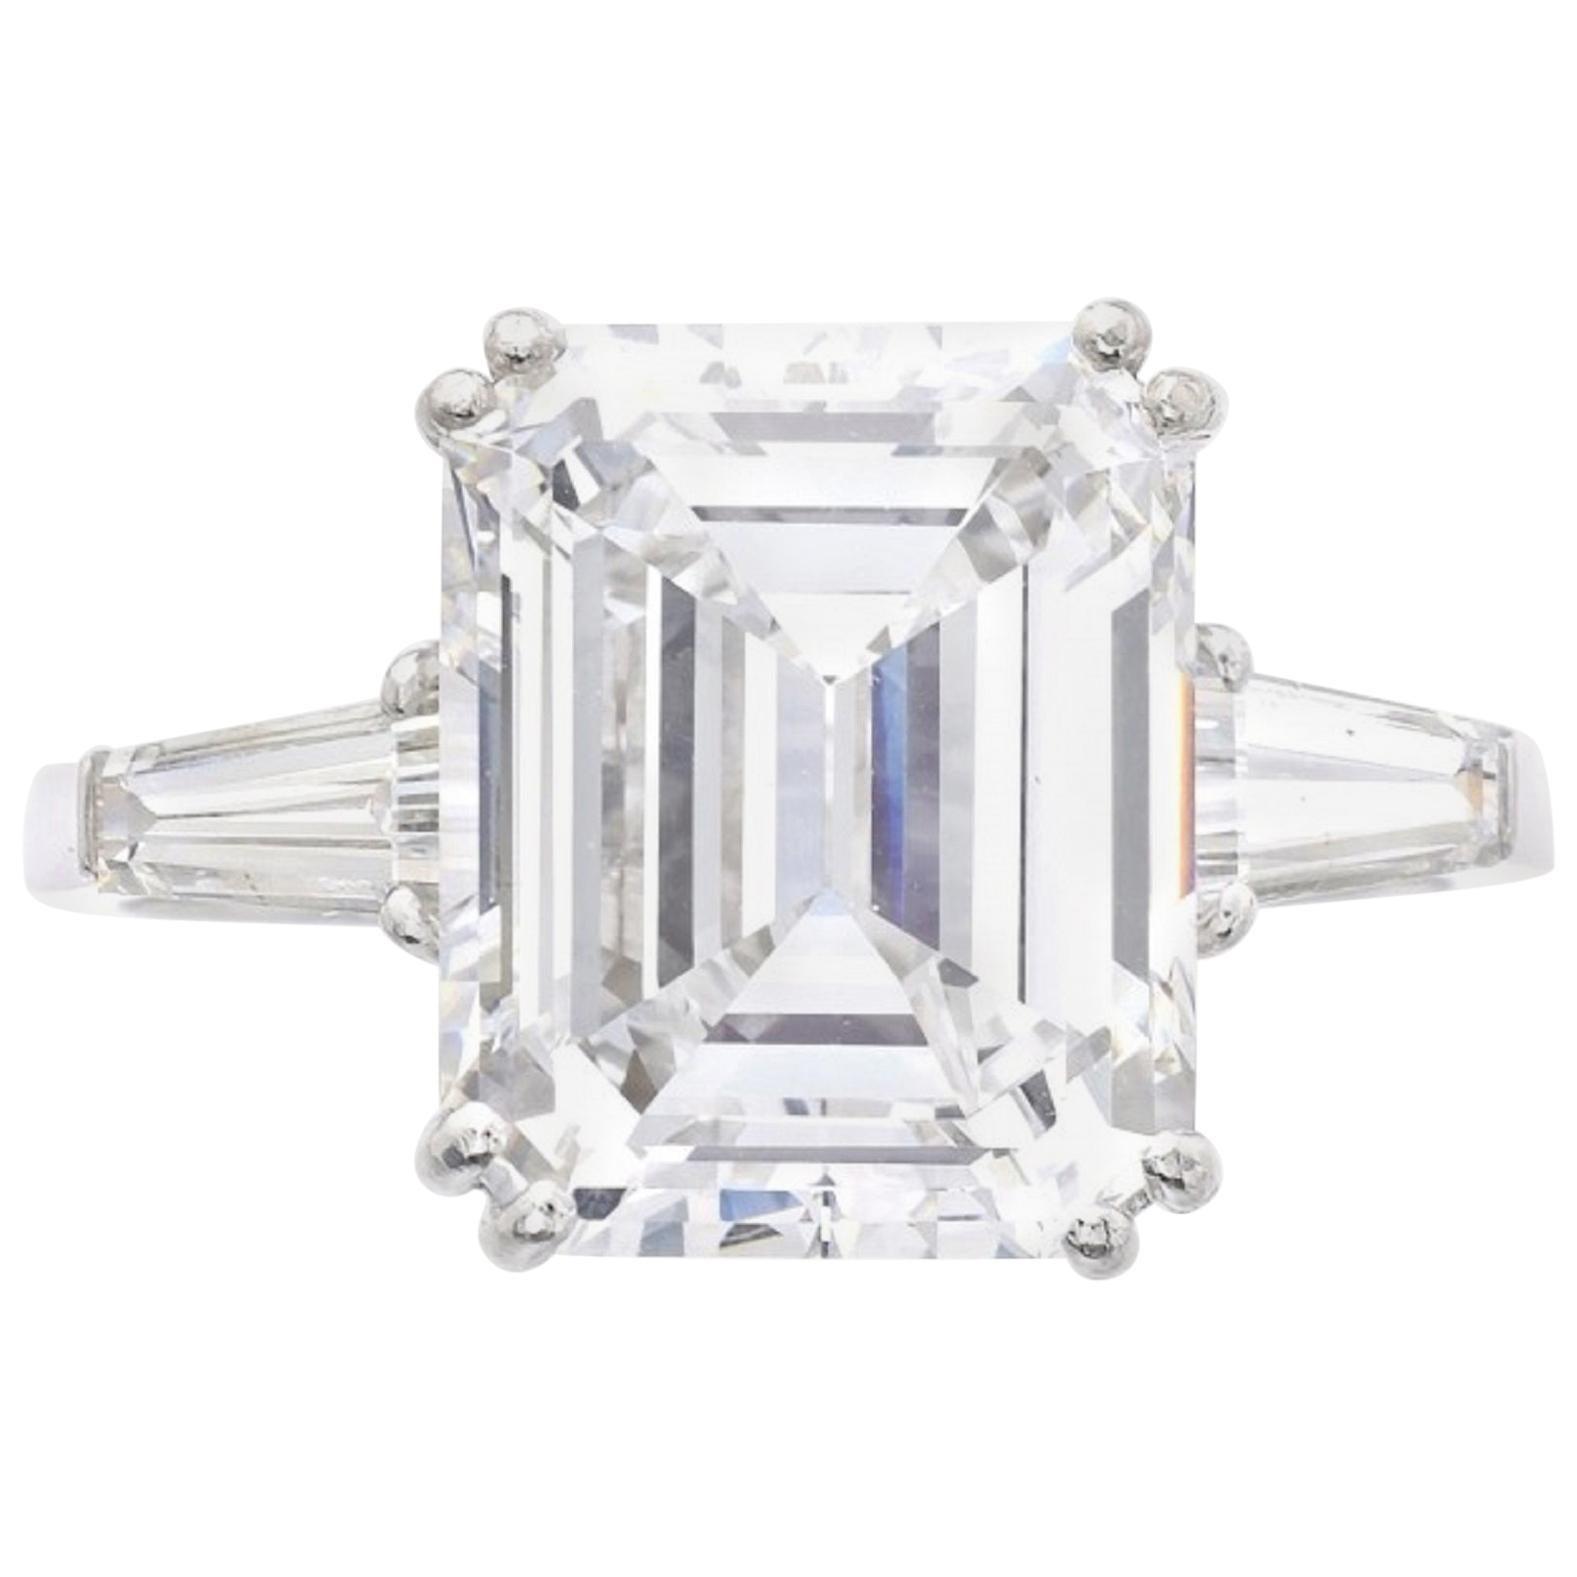 I FLAWLESS GIA Certified 2.50 Carat Emerald Cut Diamond Platinum Ring